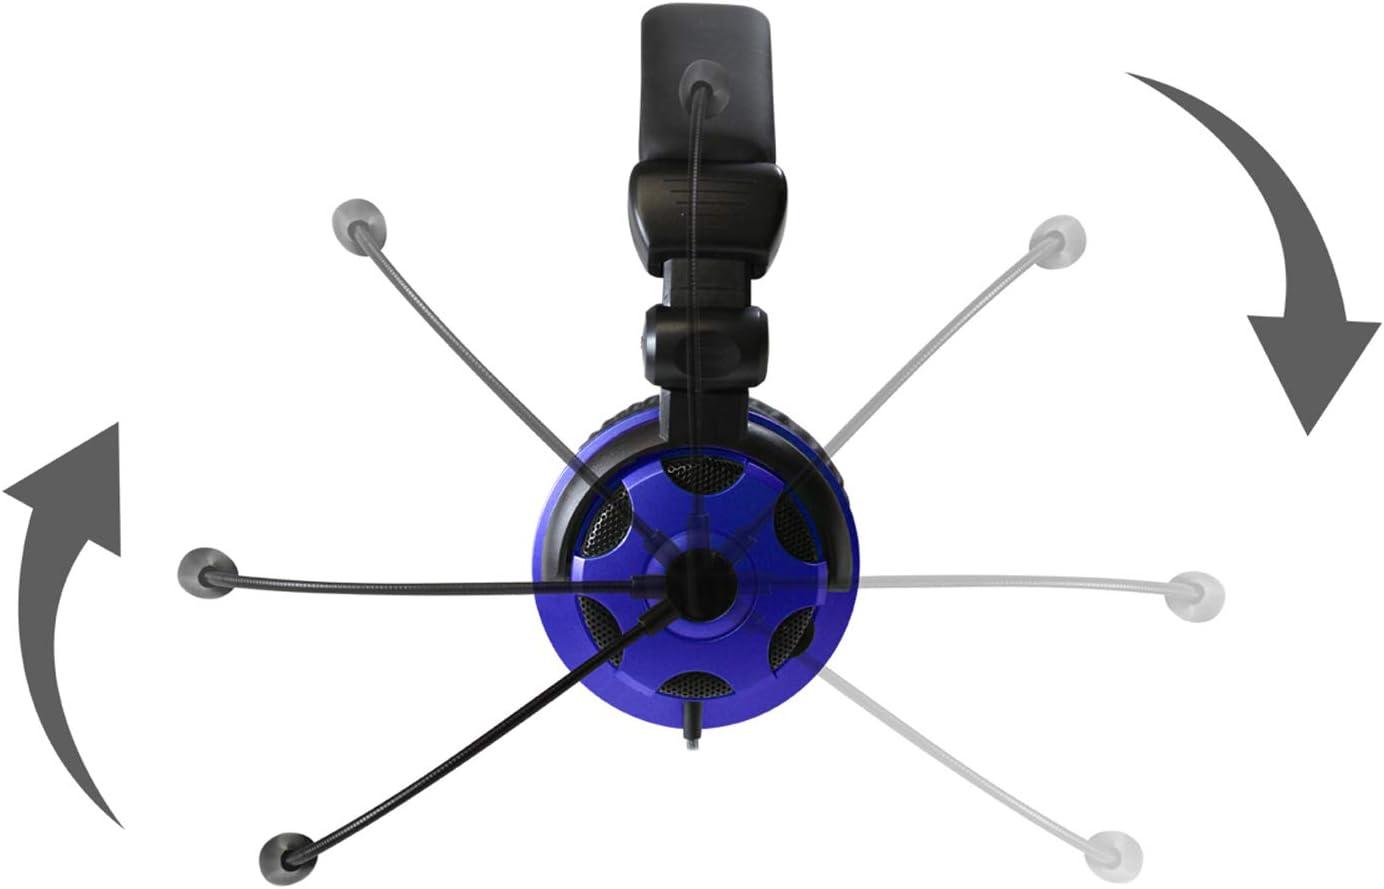 HamiltonBuhl T-PRO USB Headset with Noise-Cancelling Mic